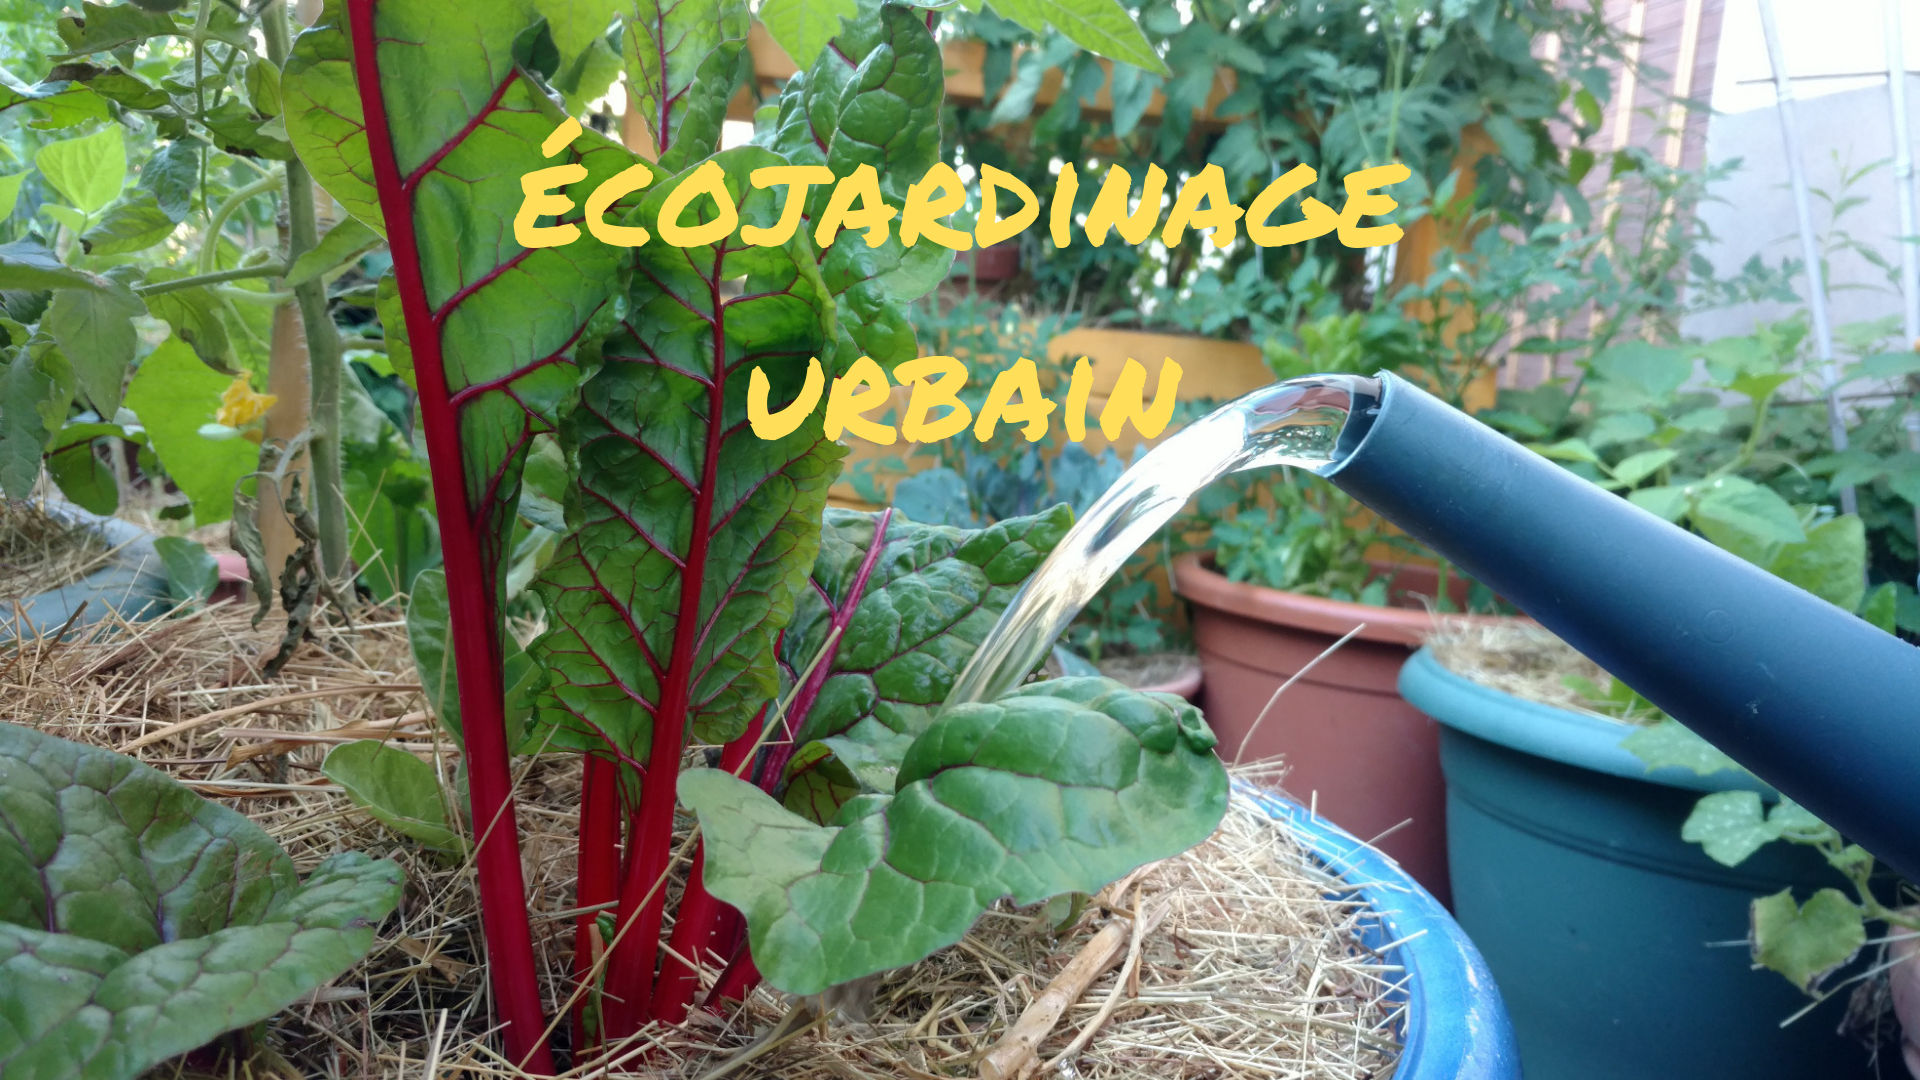 ecojardinage-urbain-permaculture-potager-terrasse